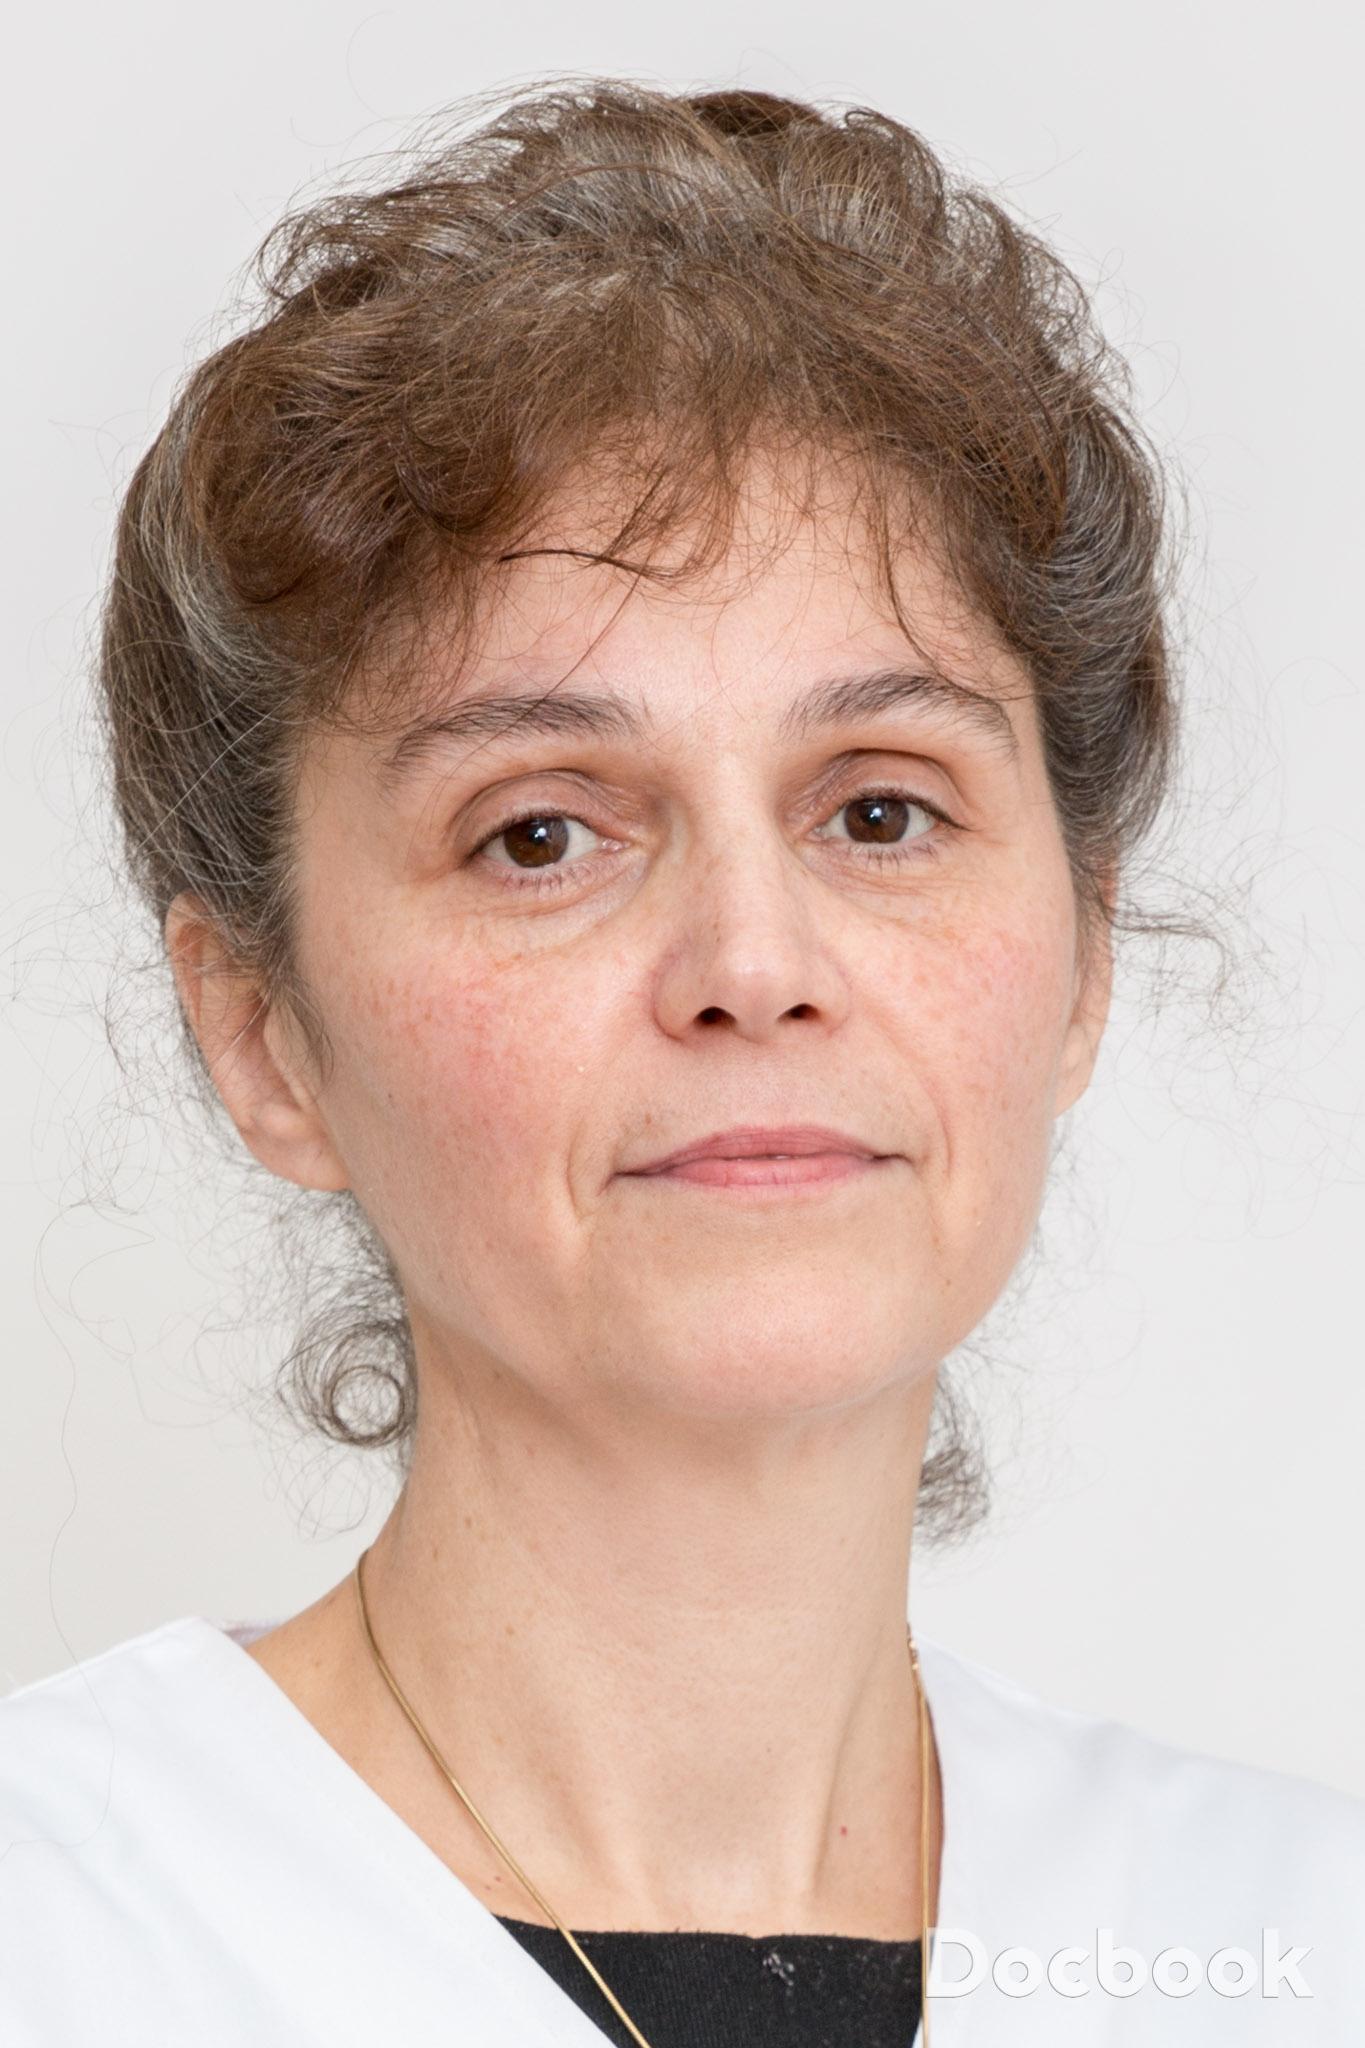 Dr. Marilena - Filomela Petrescu